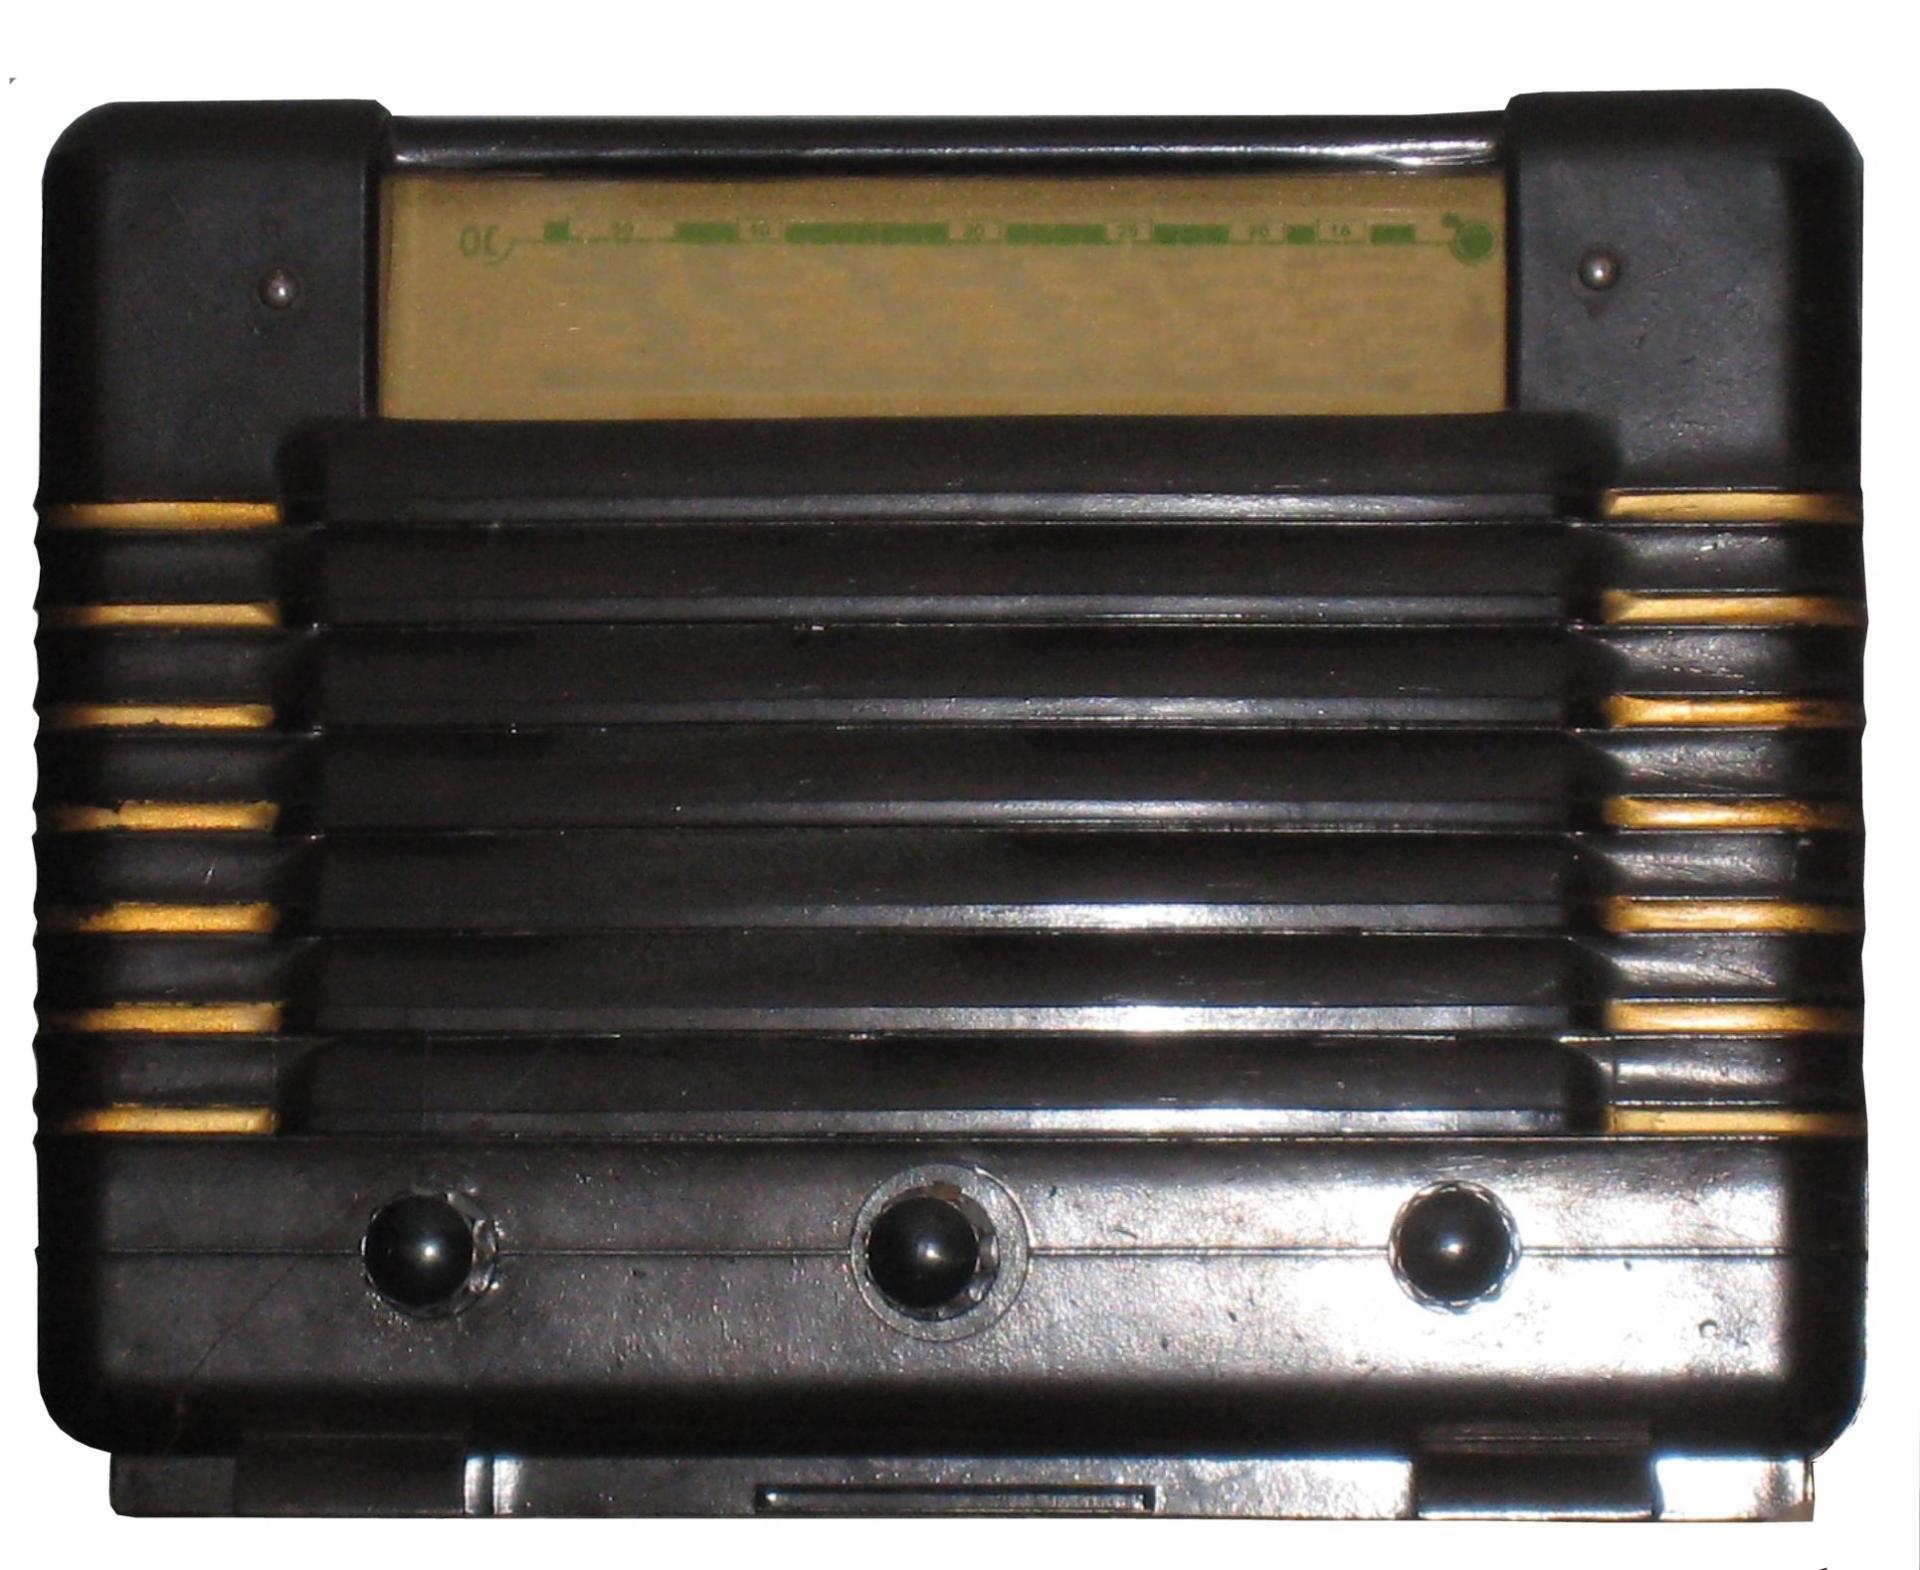 Radiola RA133UL